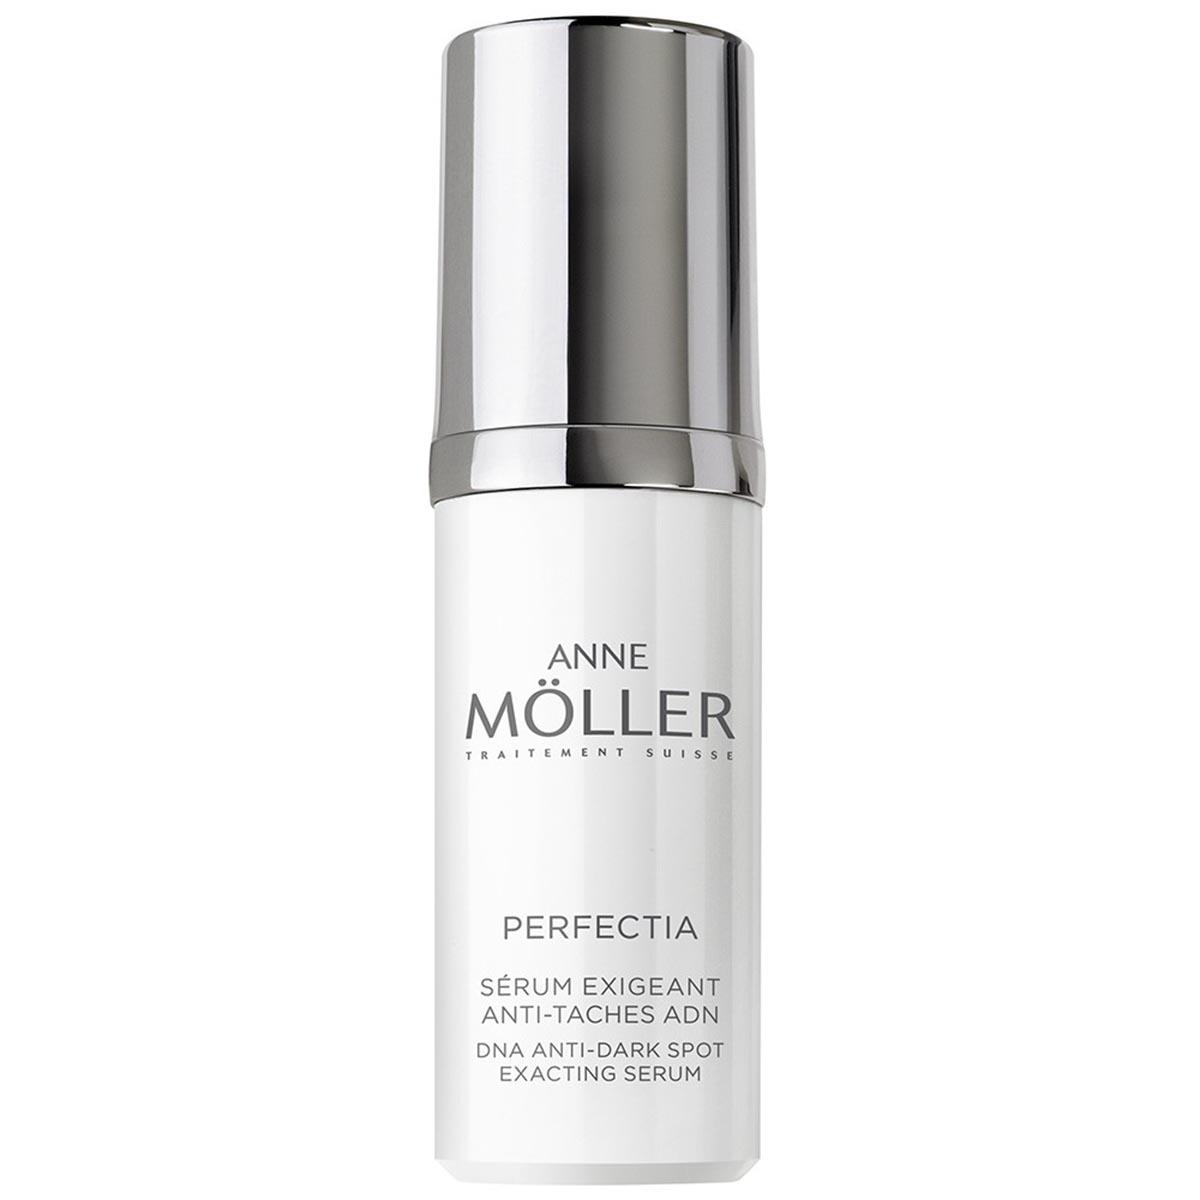 Anne moller perfectia serum exigeant anti taches adn 30ml